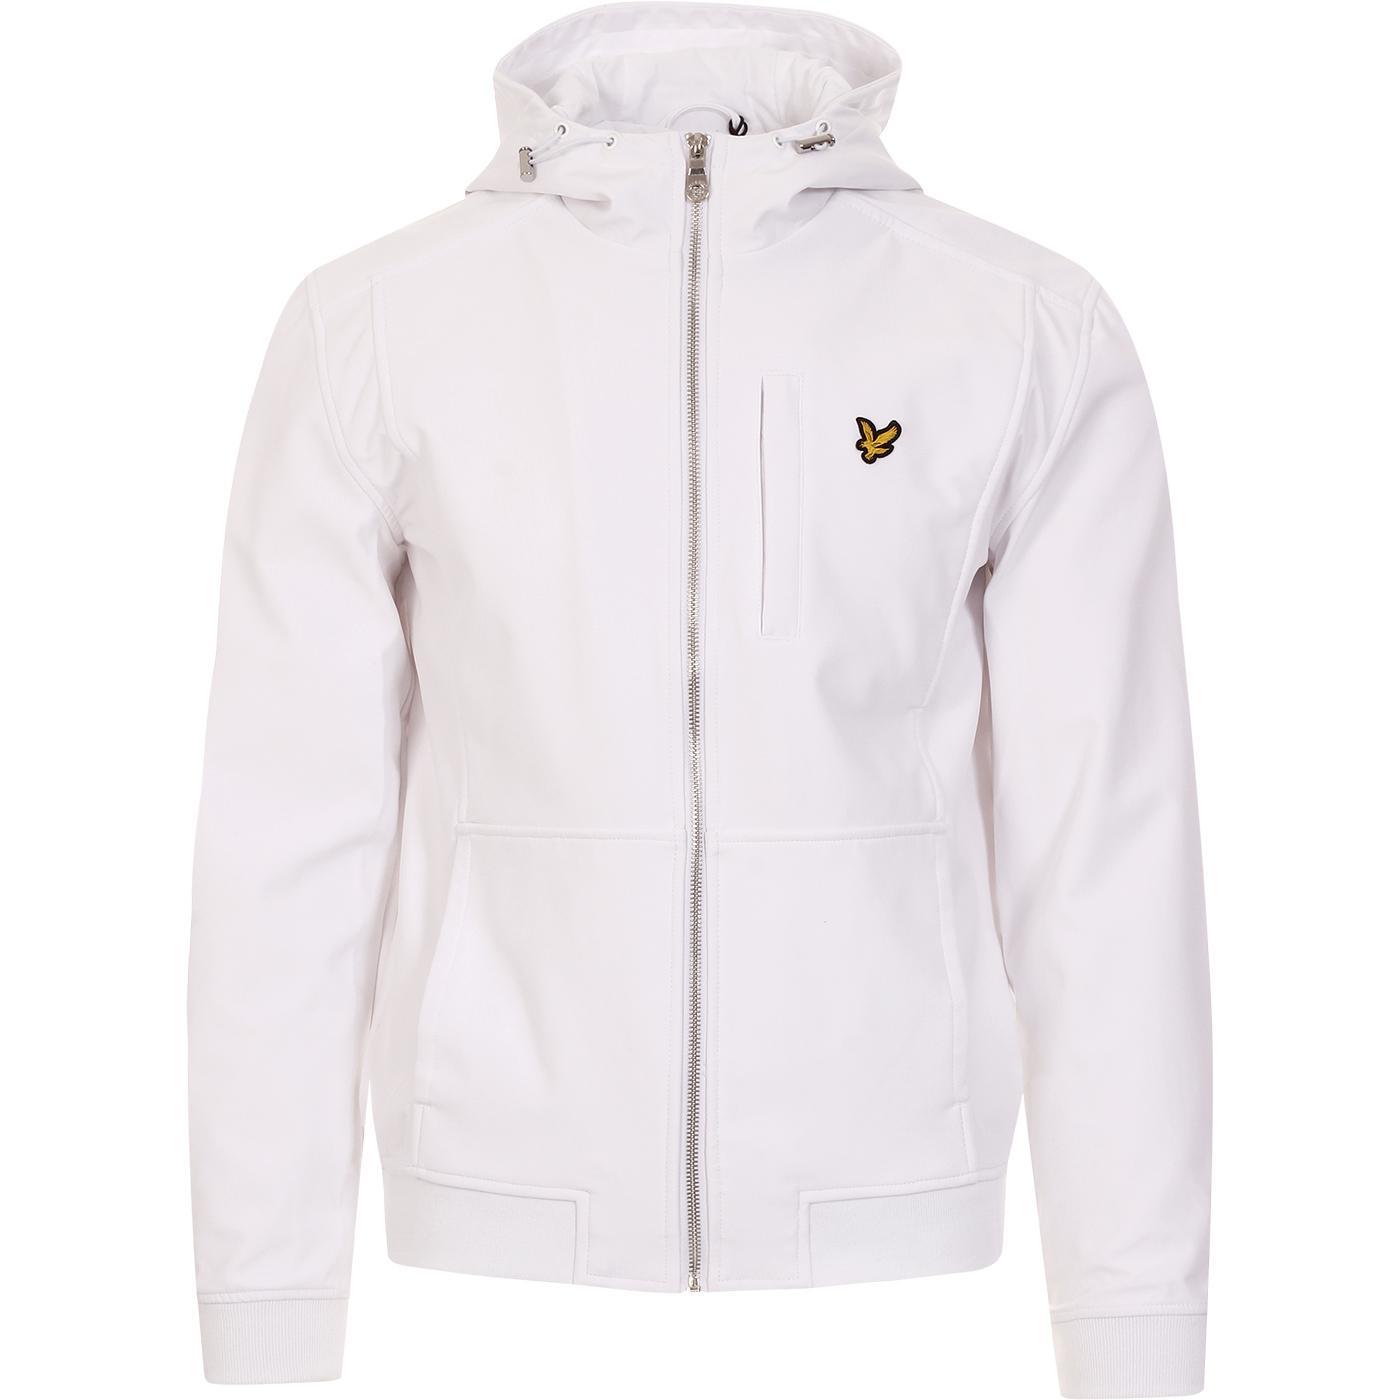 LYLE & SCOTT Retro Hooded Softshell Jacket (White)